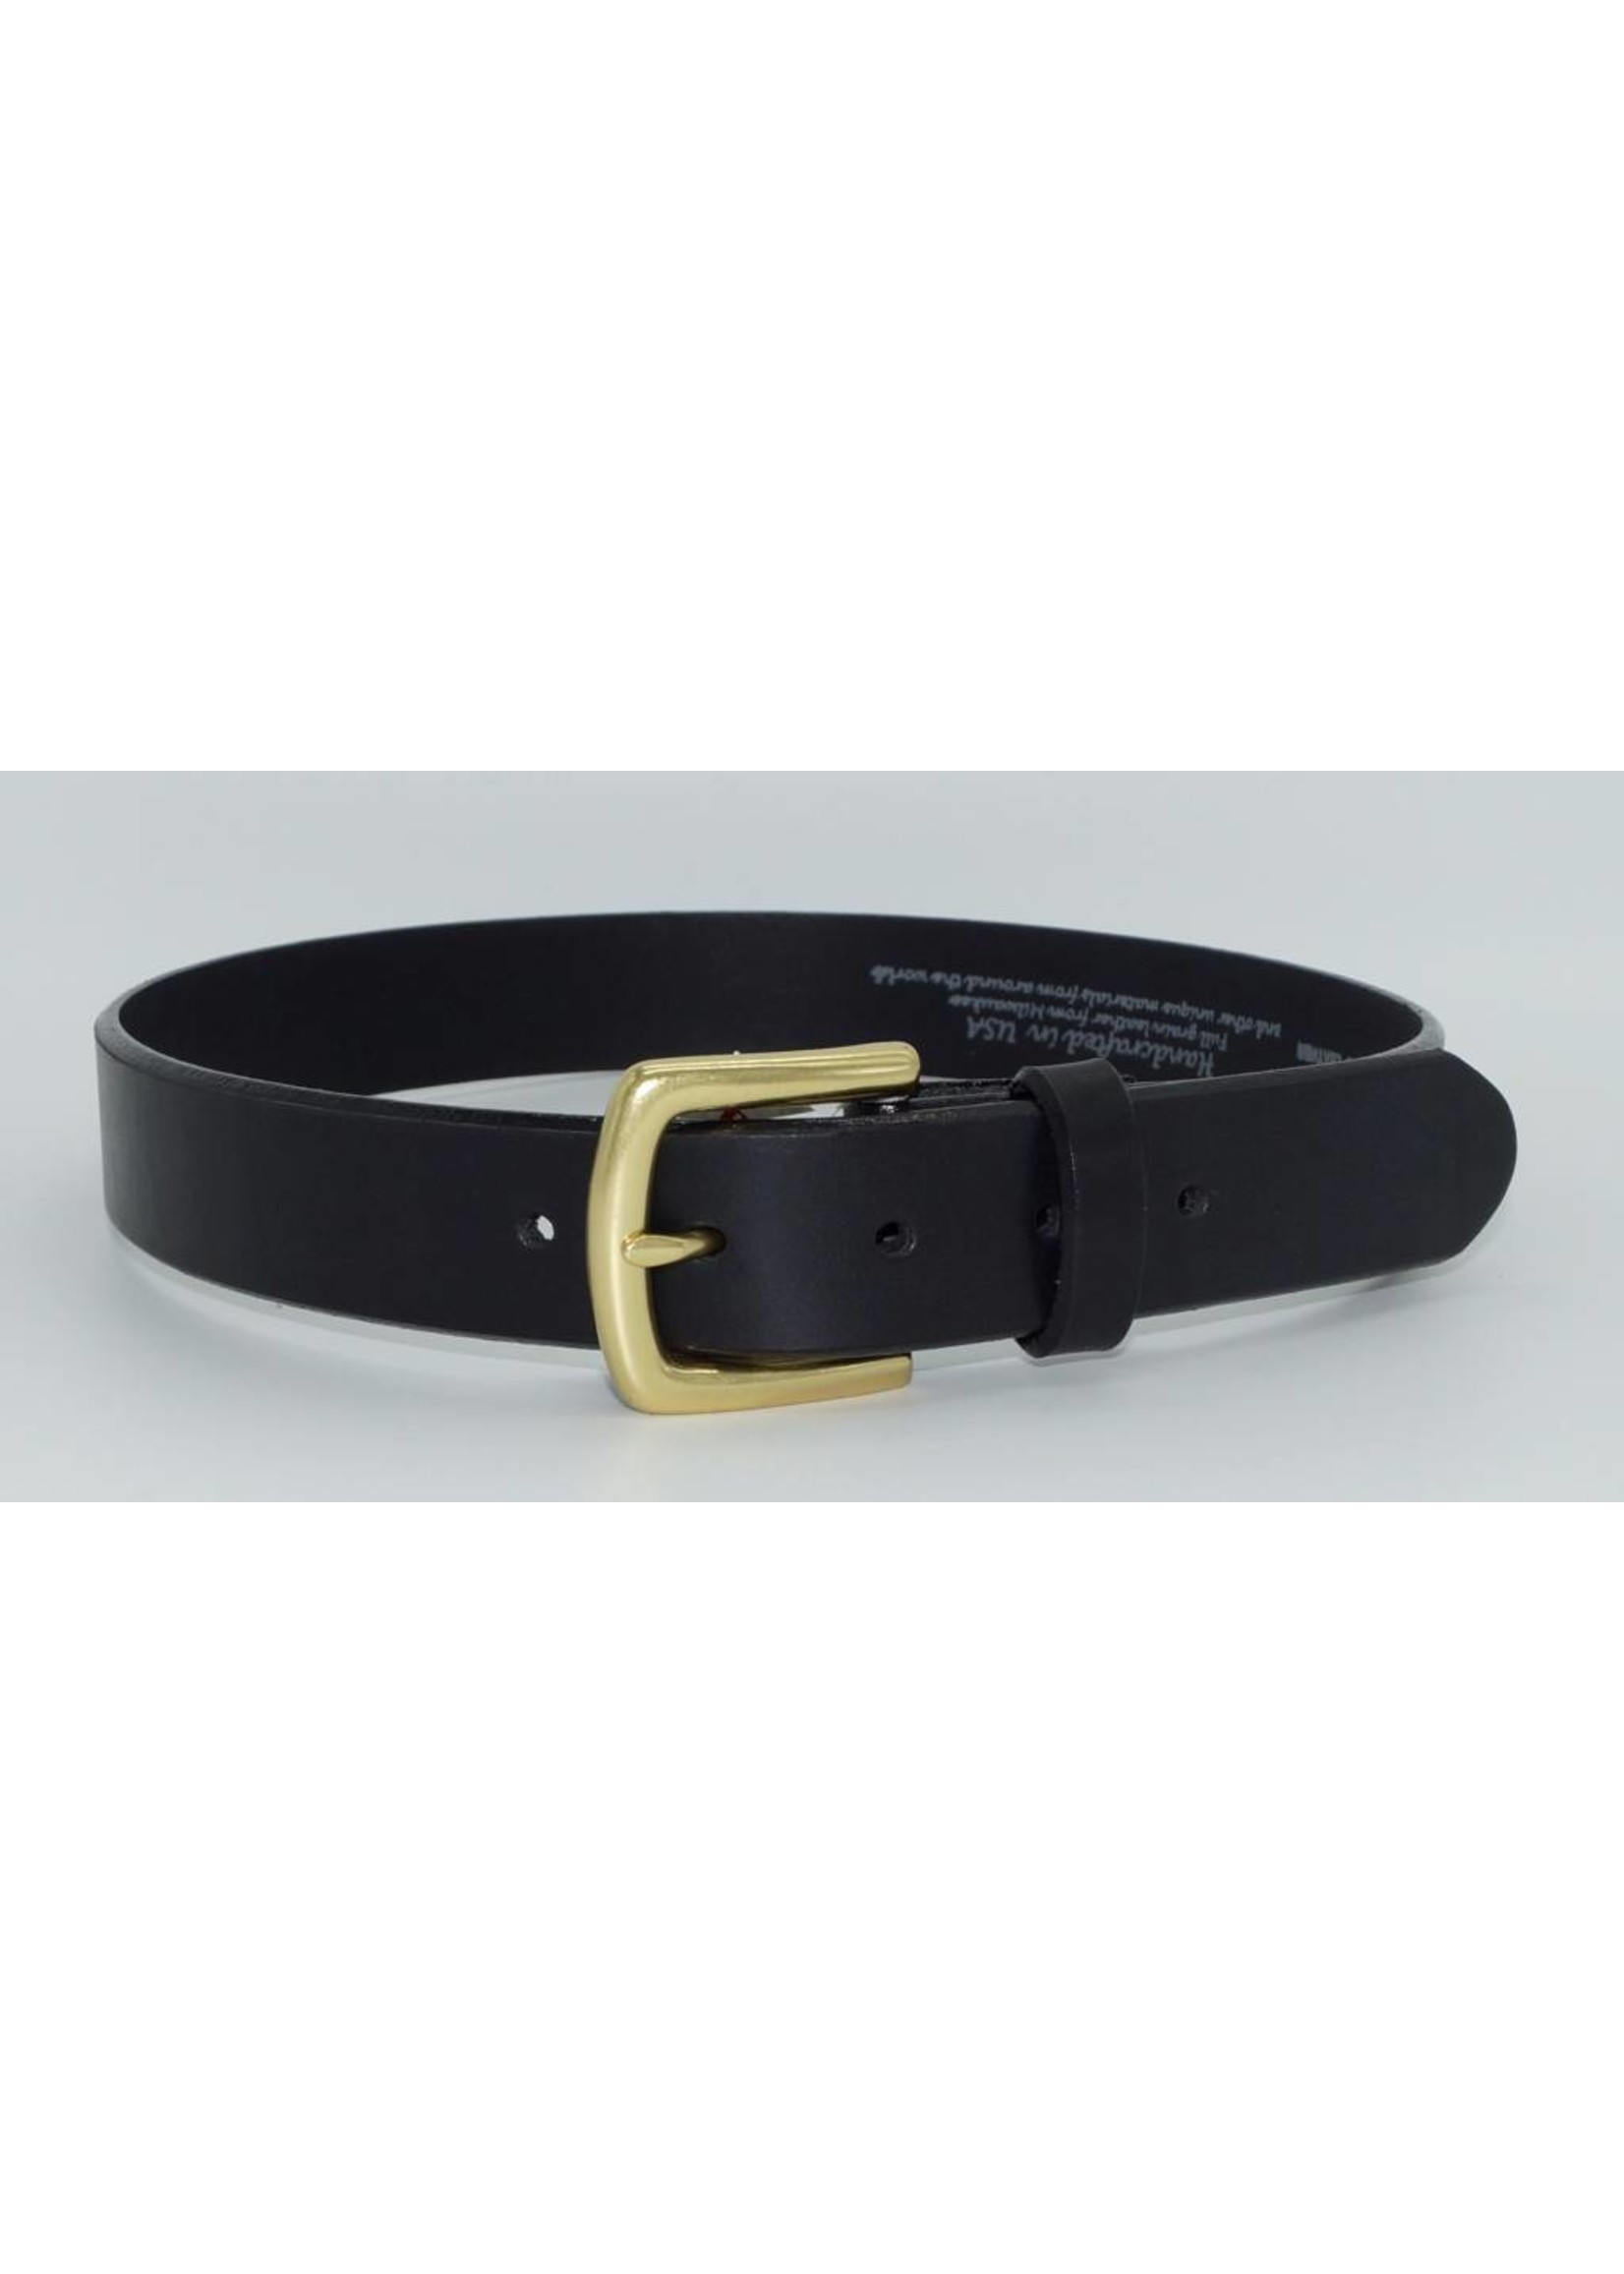 Leegin Leegin English Bevel Belt Black 21803